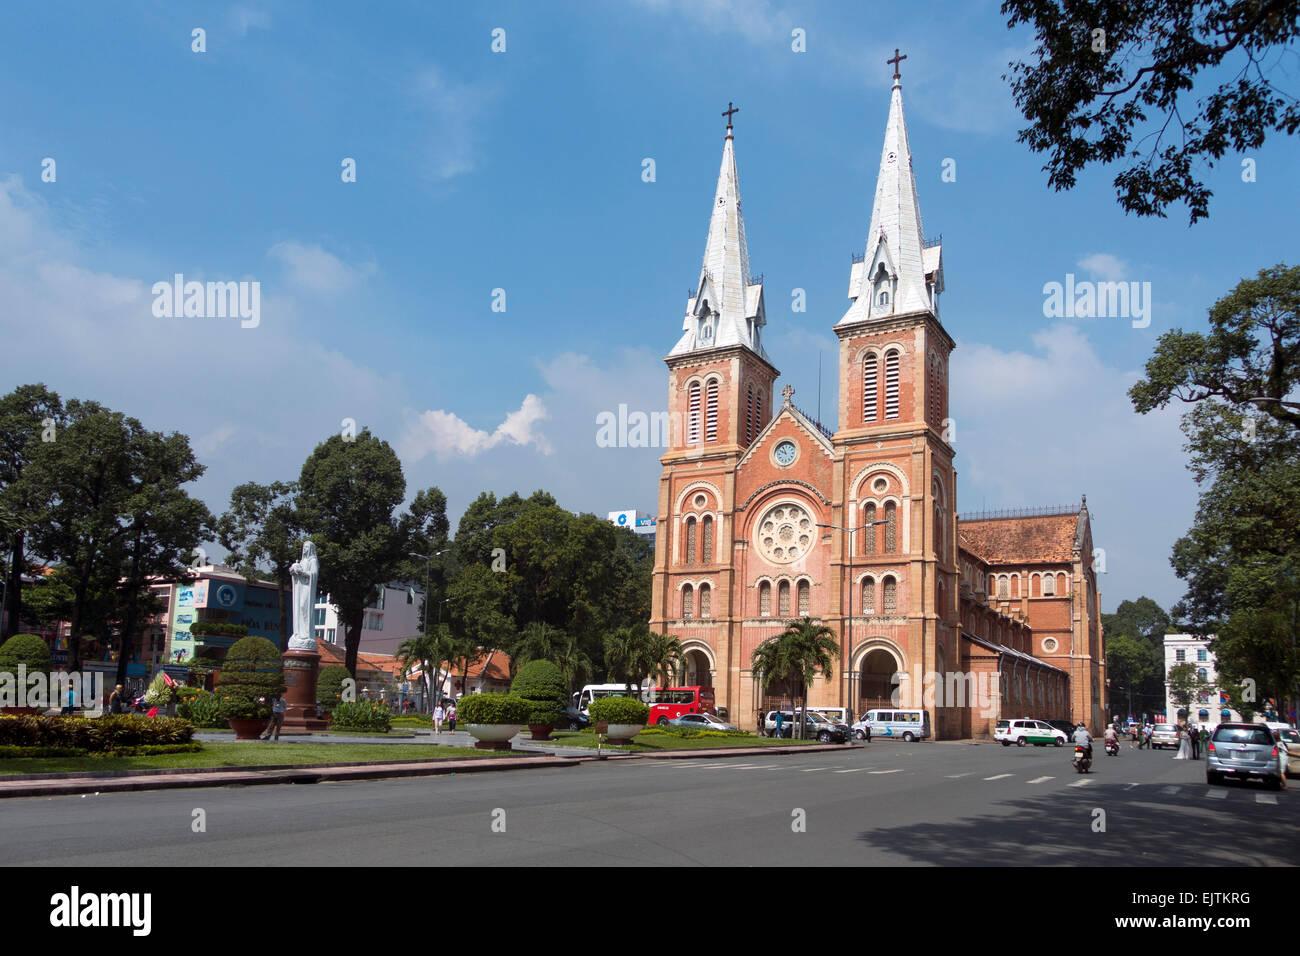 Notre Dame Church, Ho Chi Minh City, Vietnam - Stock Image